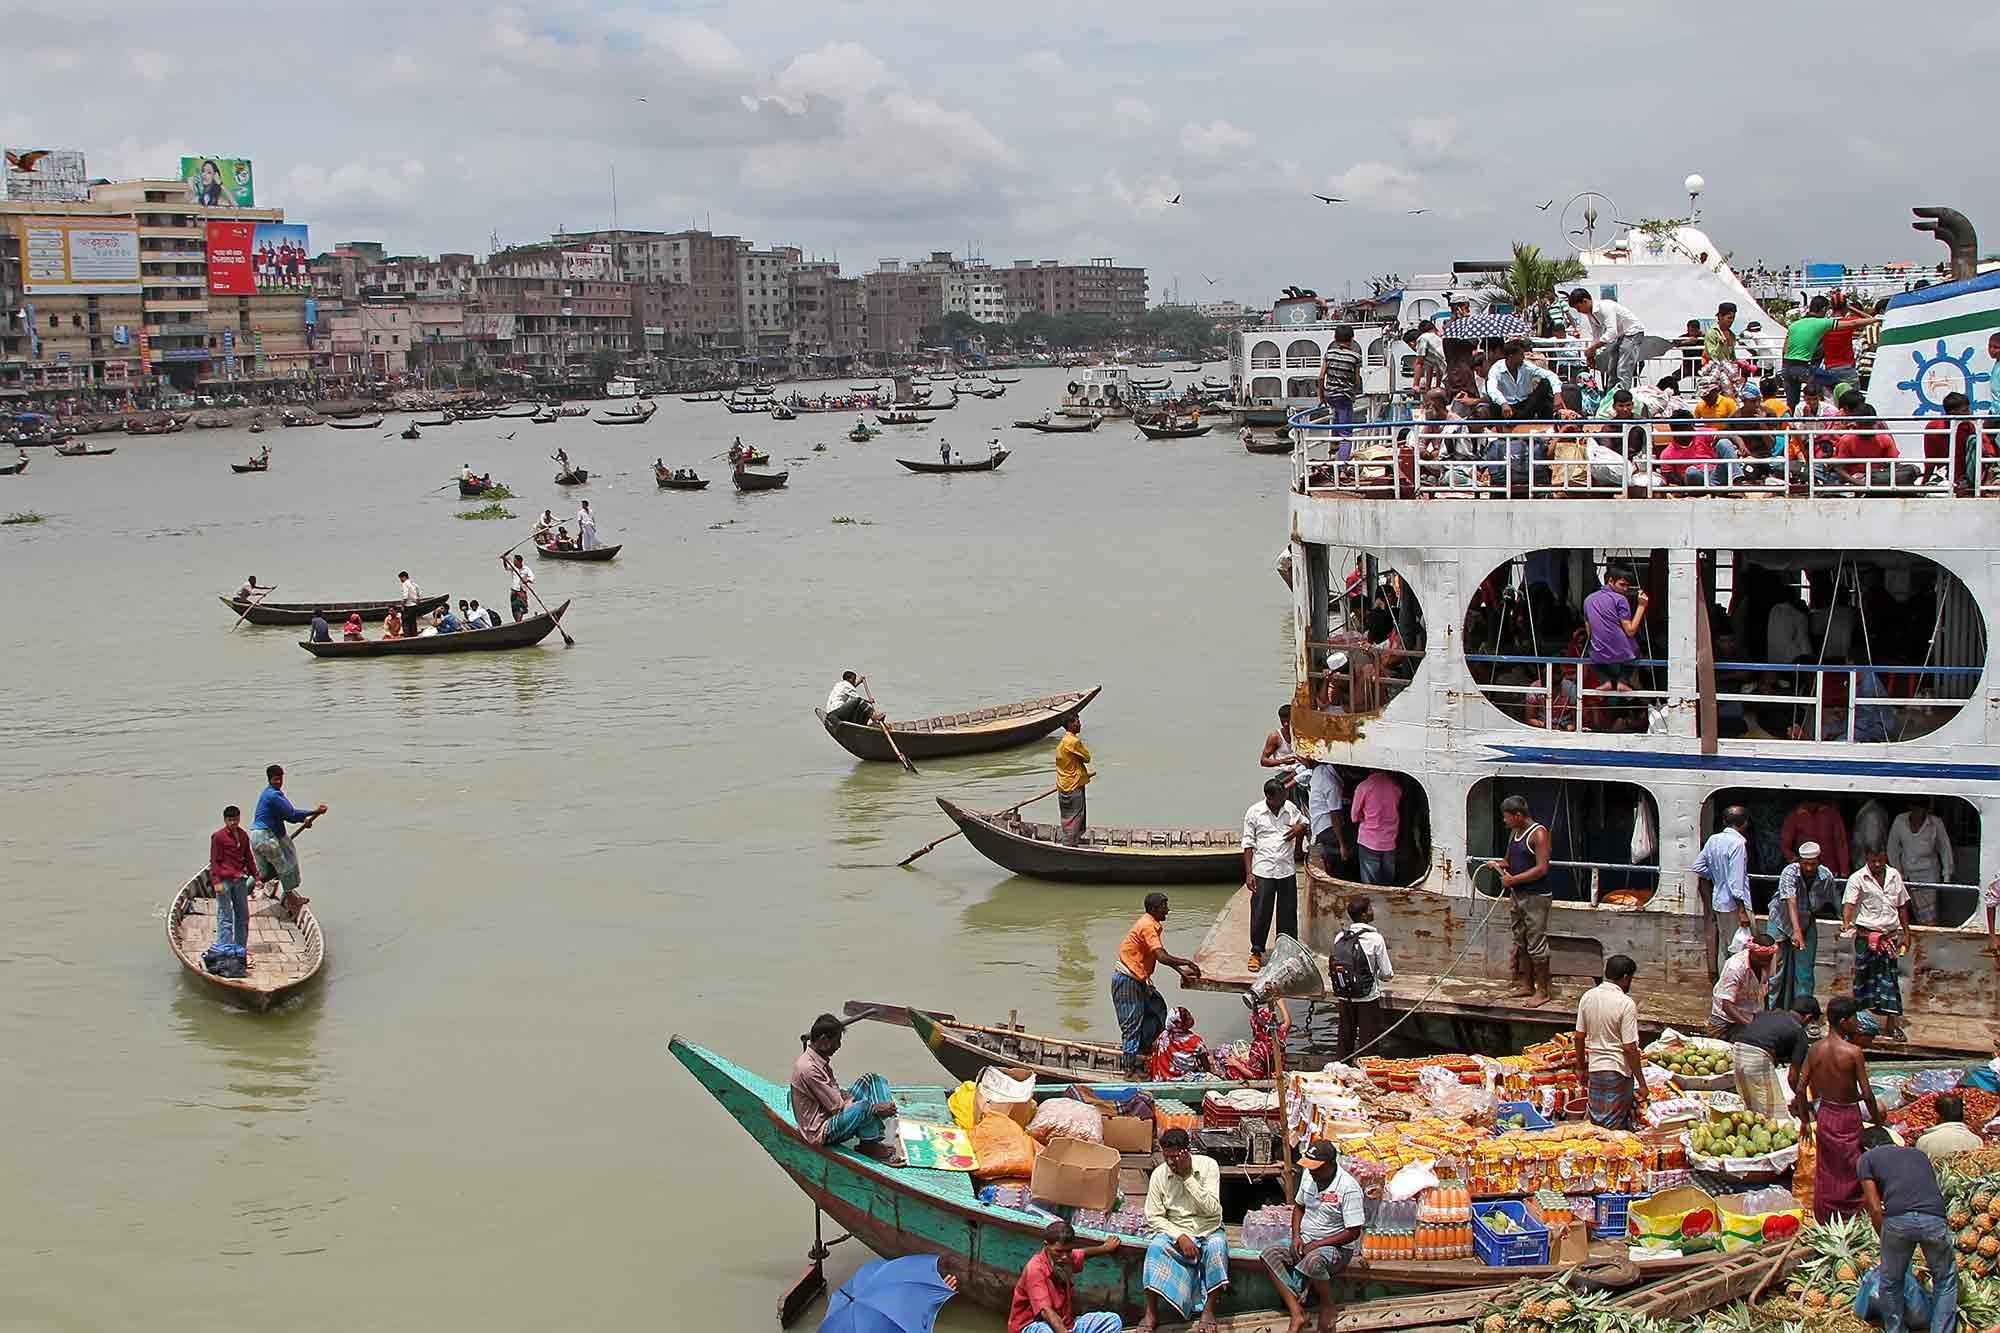 Launches at Sadarghat Port in Dhaka, Bangladesh. © Ulli Maier & Nisa Maier